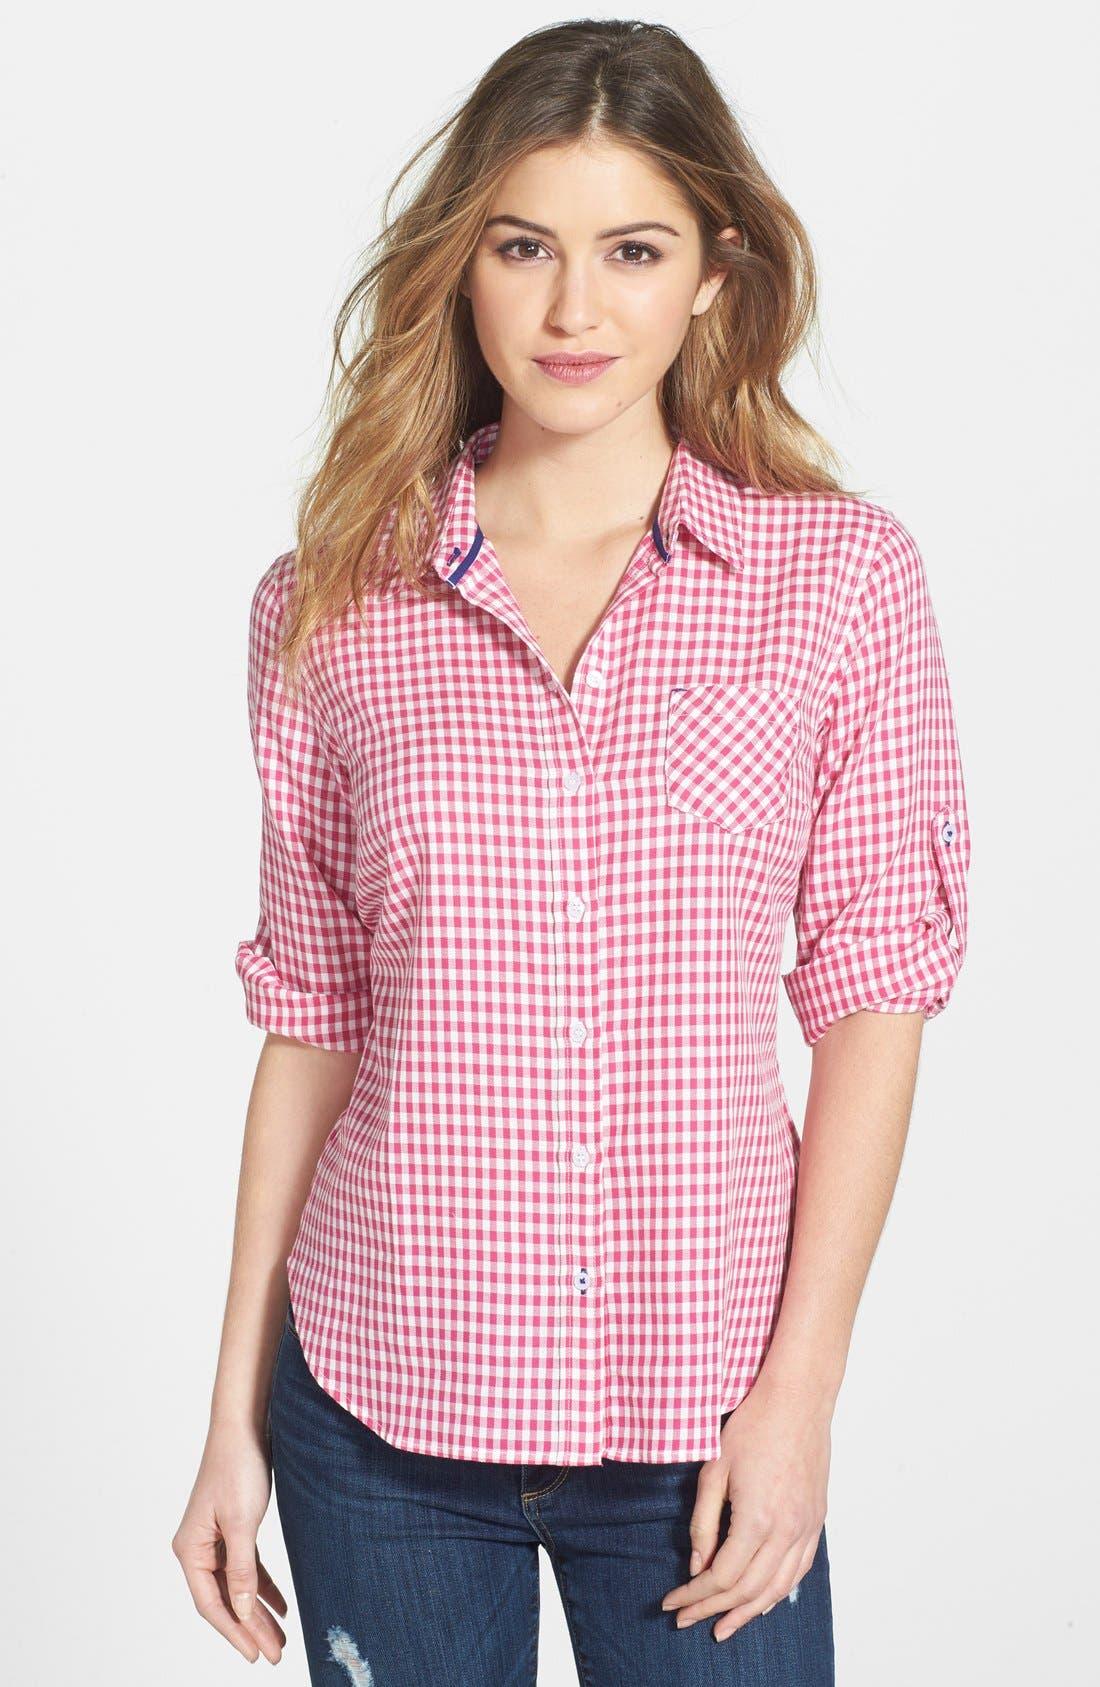 Main Image - Sandra Ingrish Mini Gingham Twill Shirt (Regular & Sale)